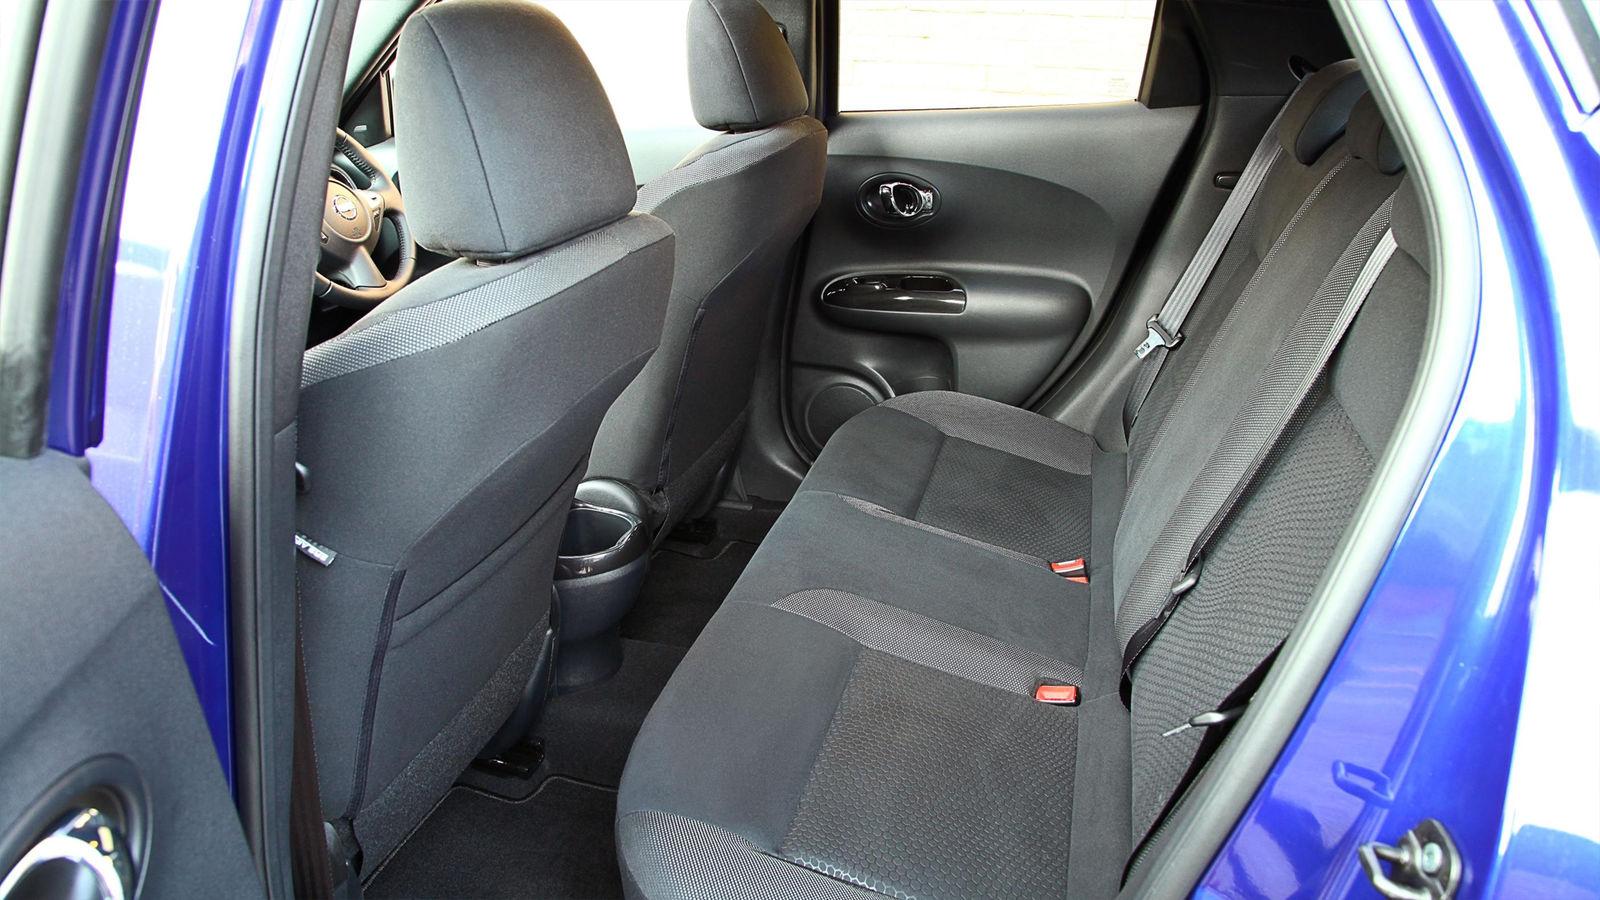 nissan juke interior trunk. internal dimensions nissan juke interior trunk